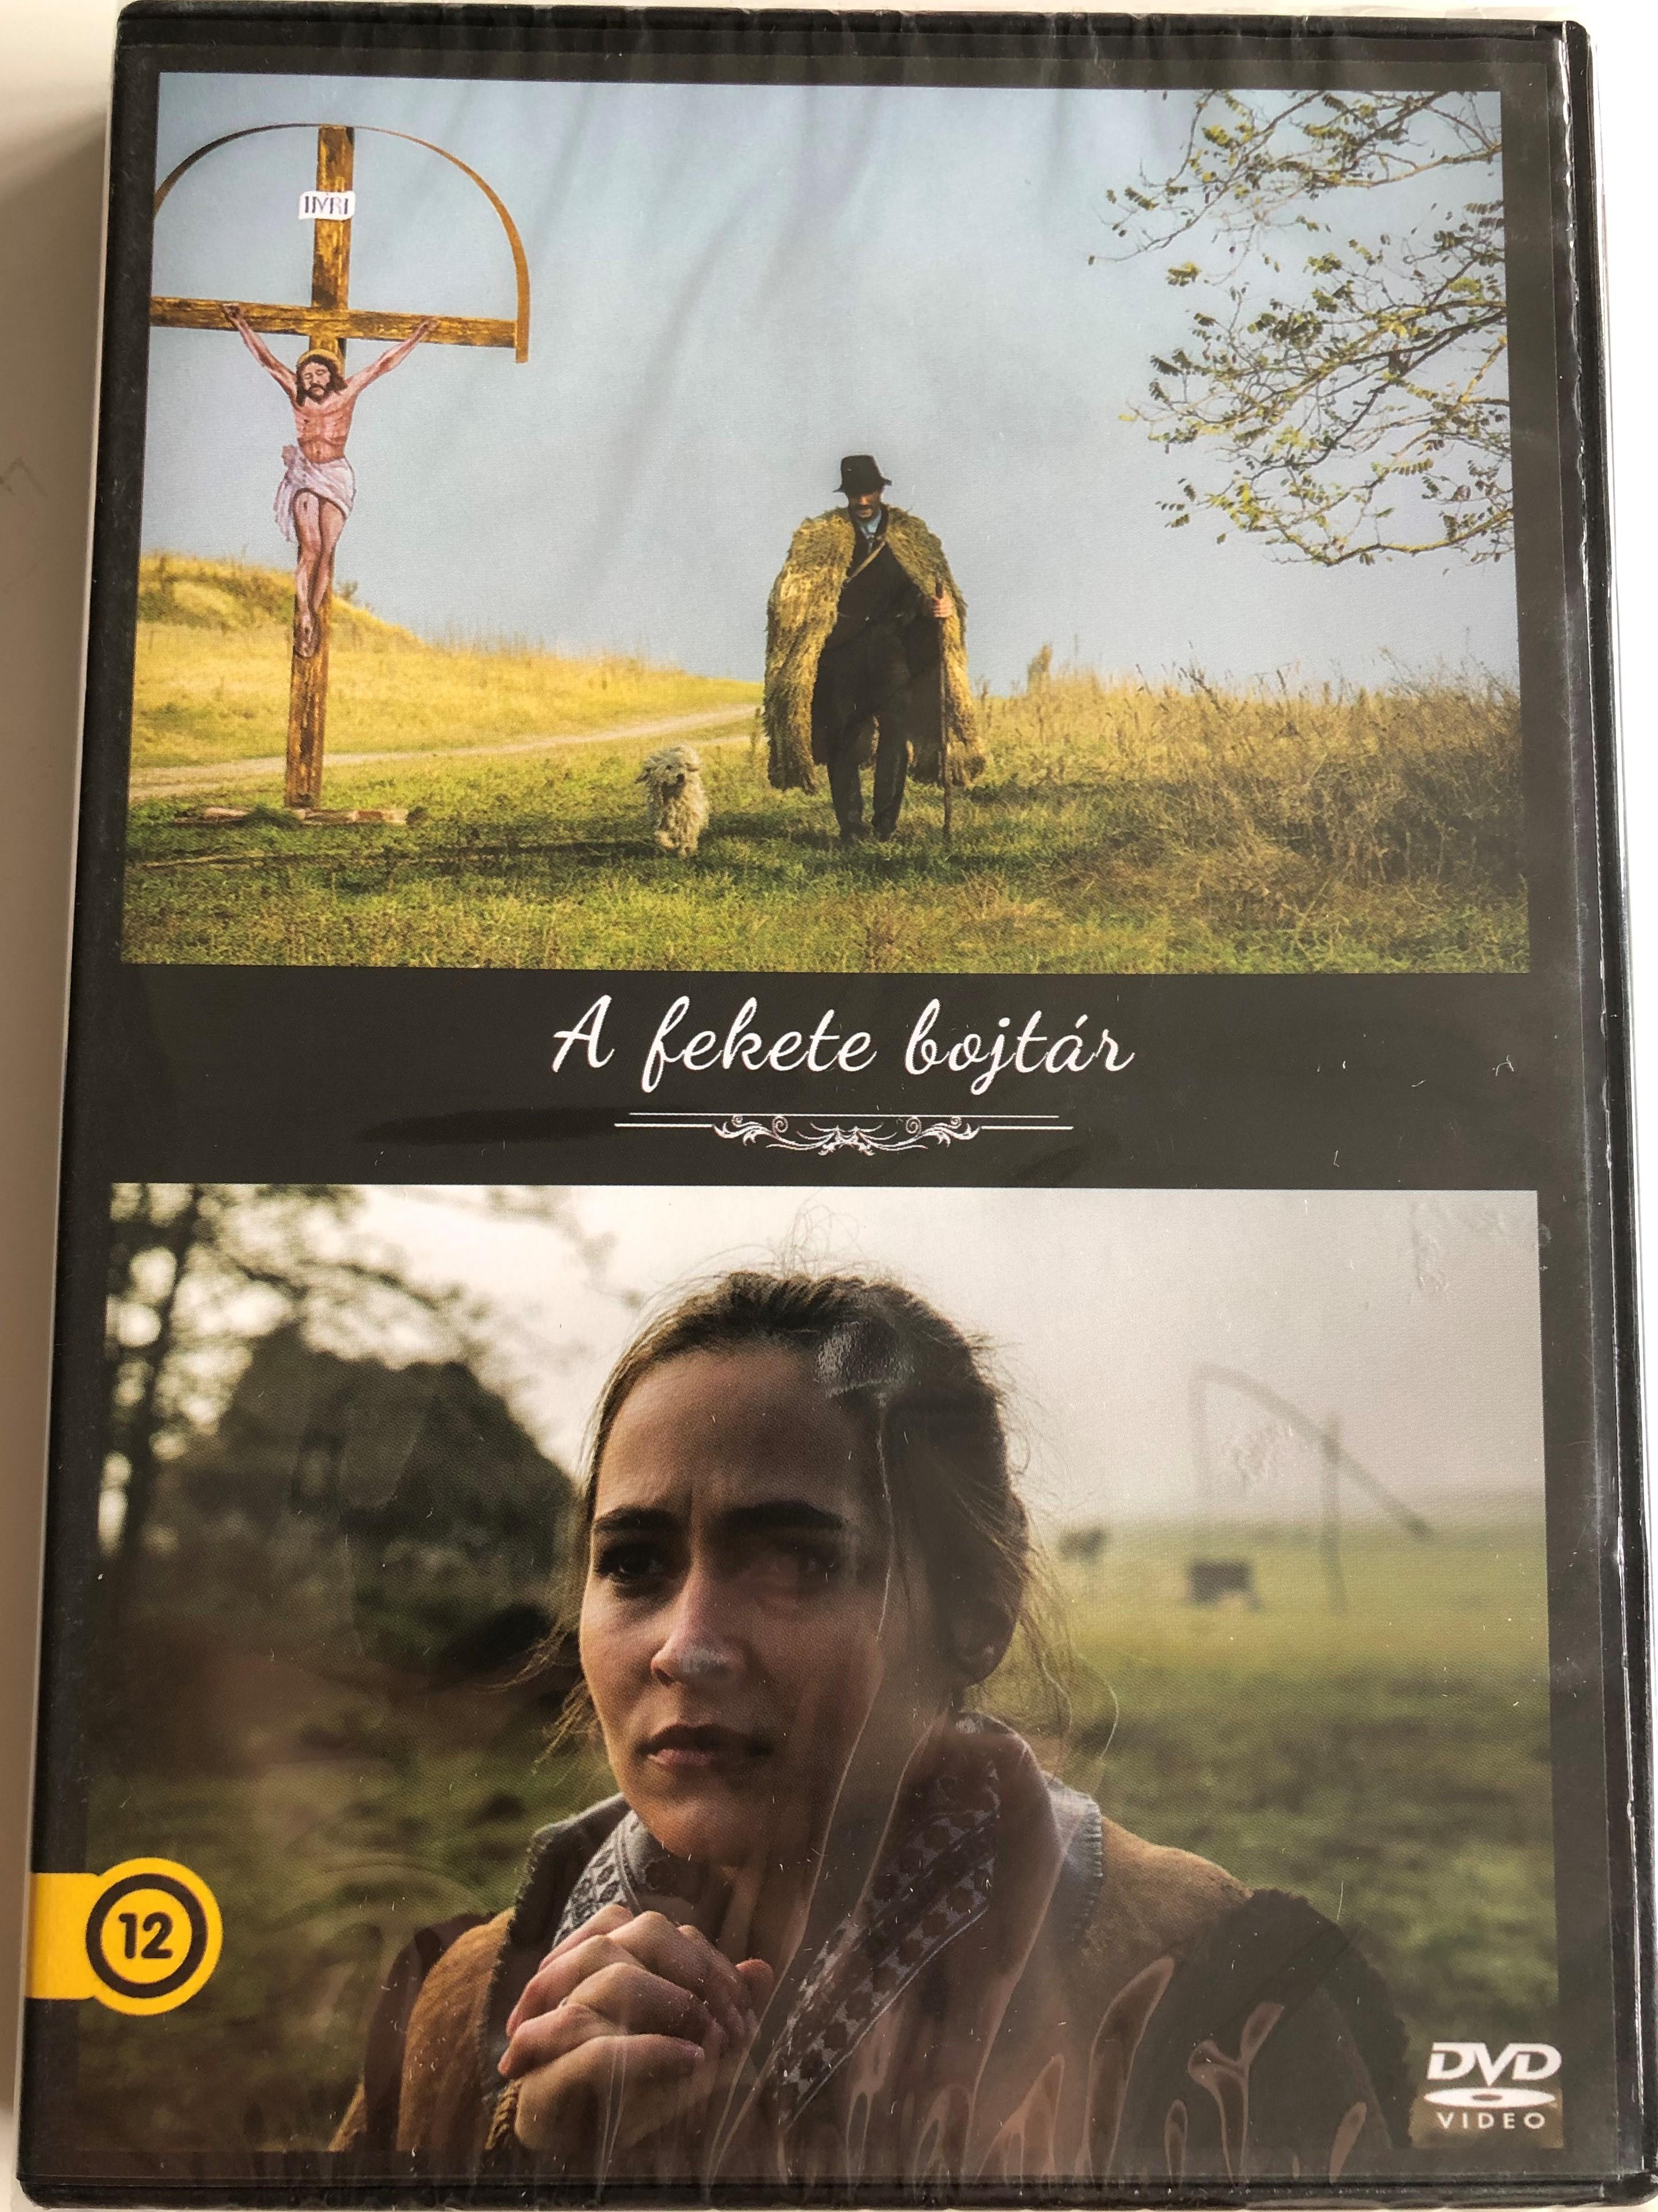 a-fekete-bojt-r-dvd-2015-directed-by-vit-zy-l-szl-1.jpg